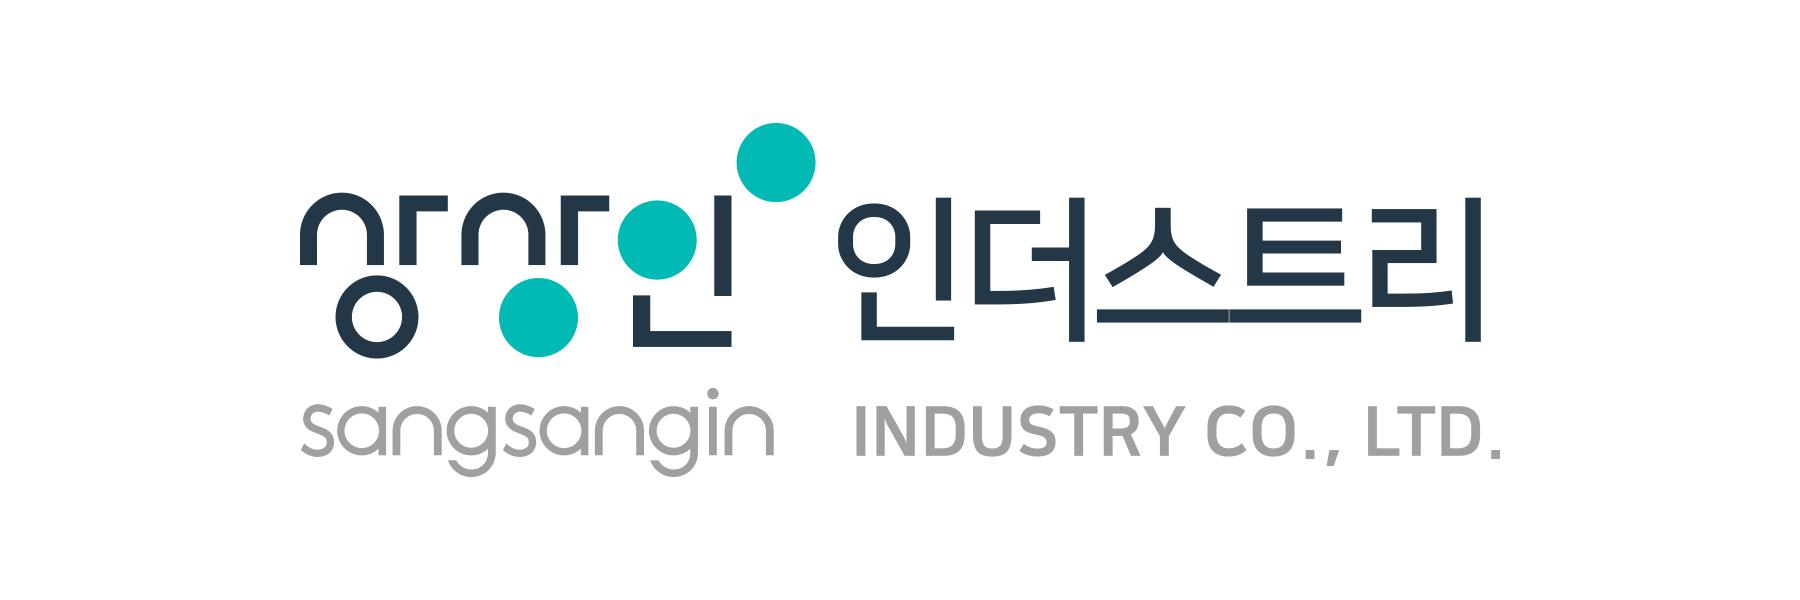 Sangsangin Industry Corporation